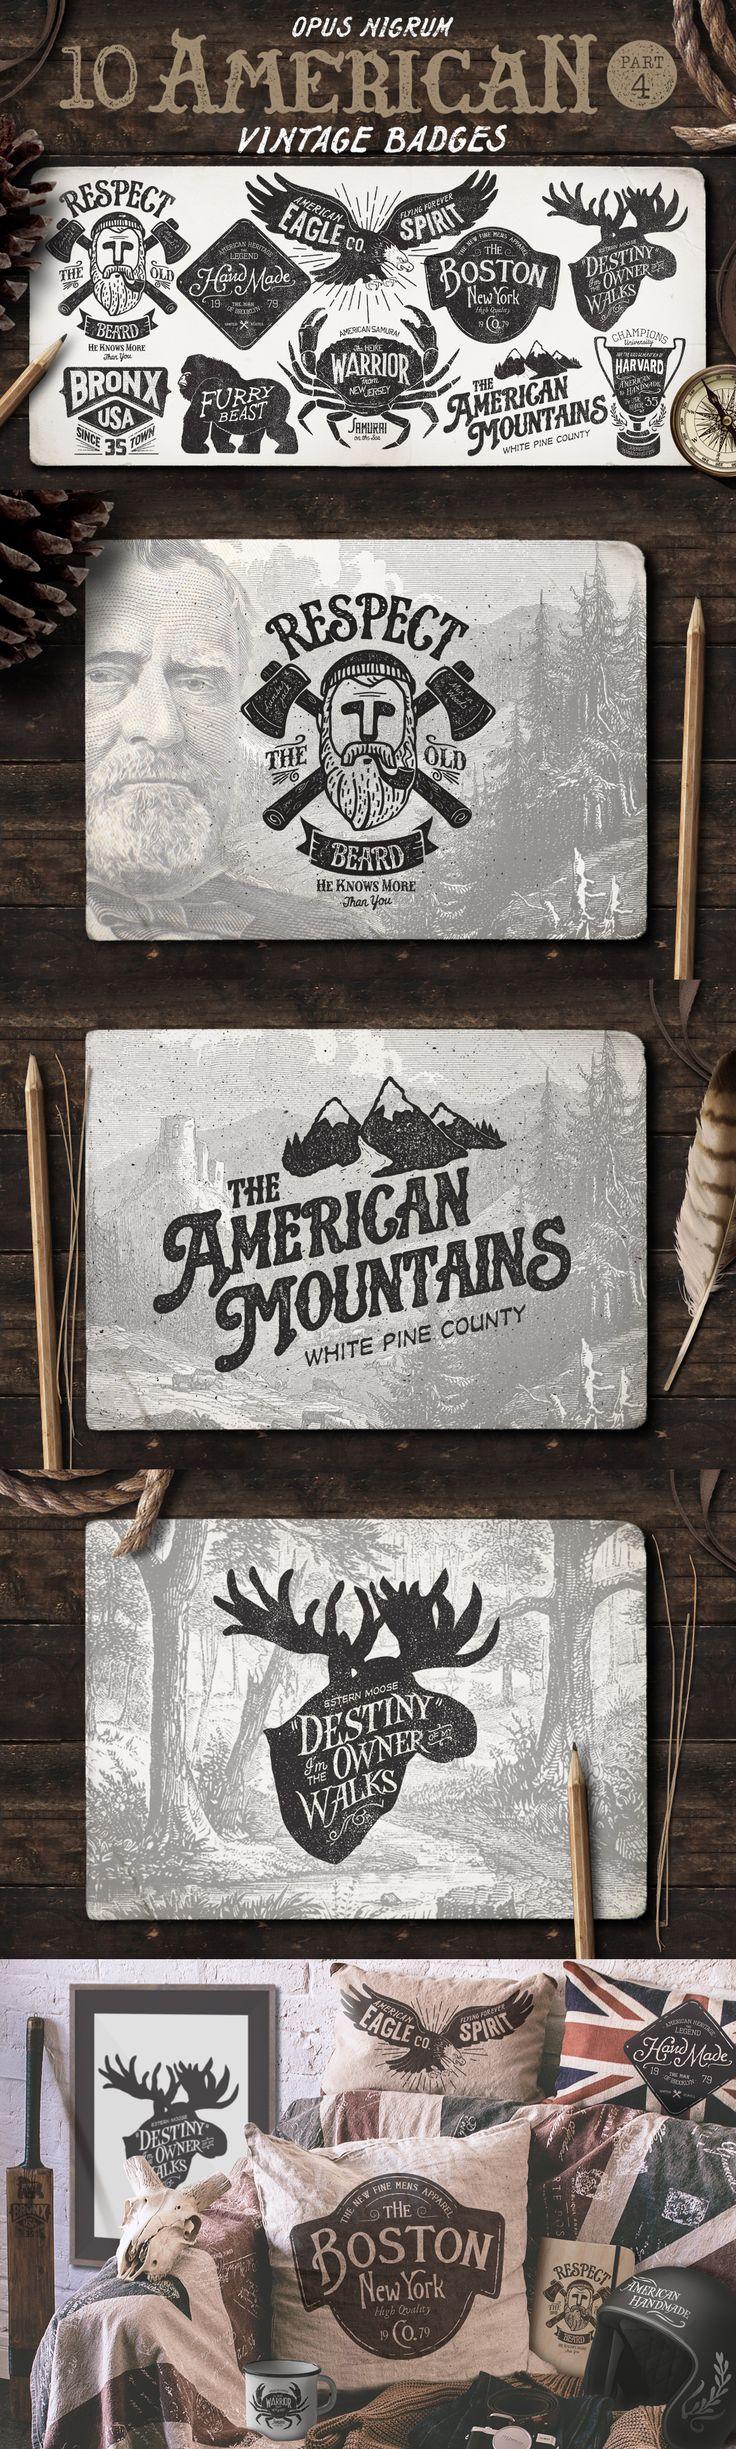 American Vintage Badges Vector Template EPS, AI #design Download: https://creativemarket.com/OpusNigrum/58511-American-Vintage-Badges-Part-4?u=ksioks